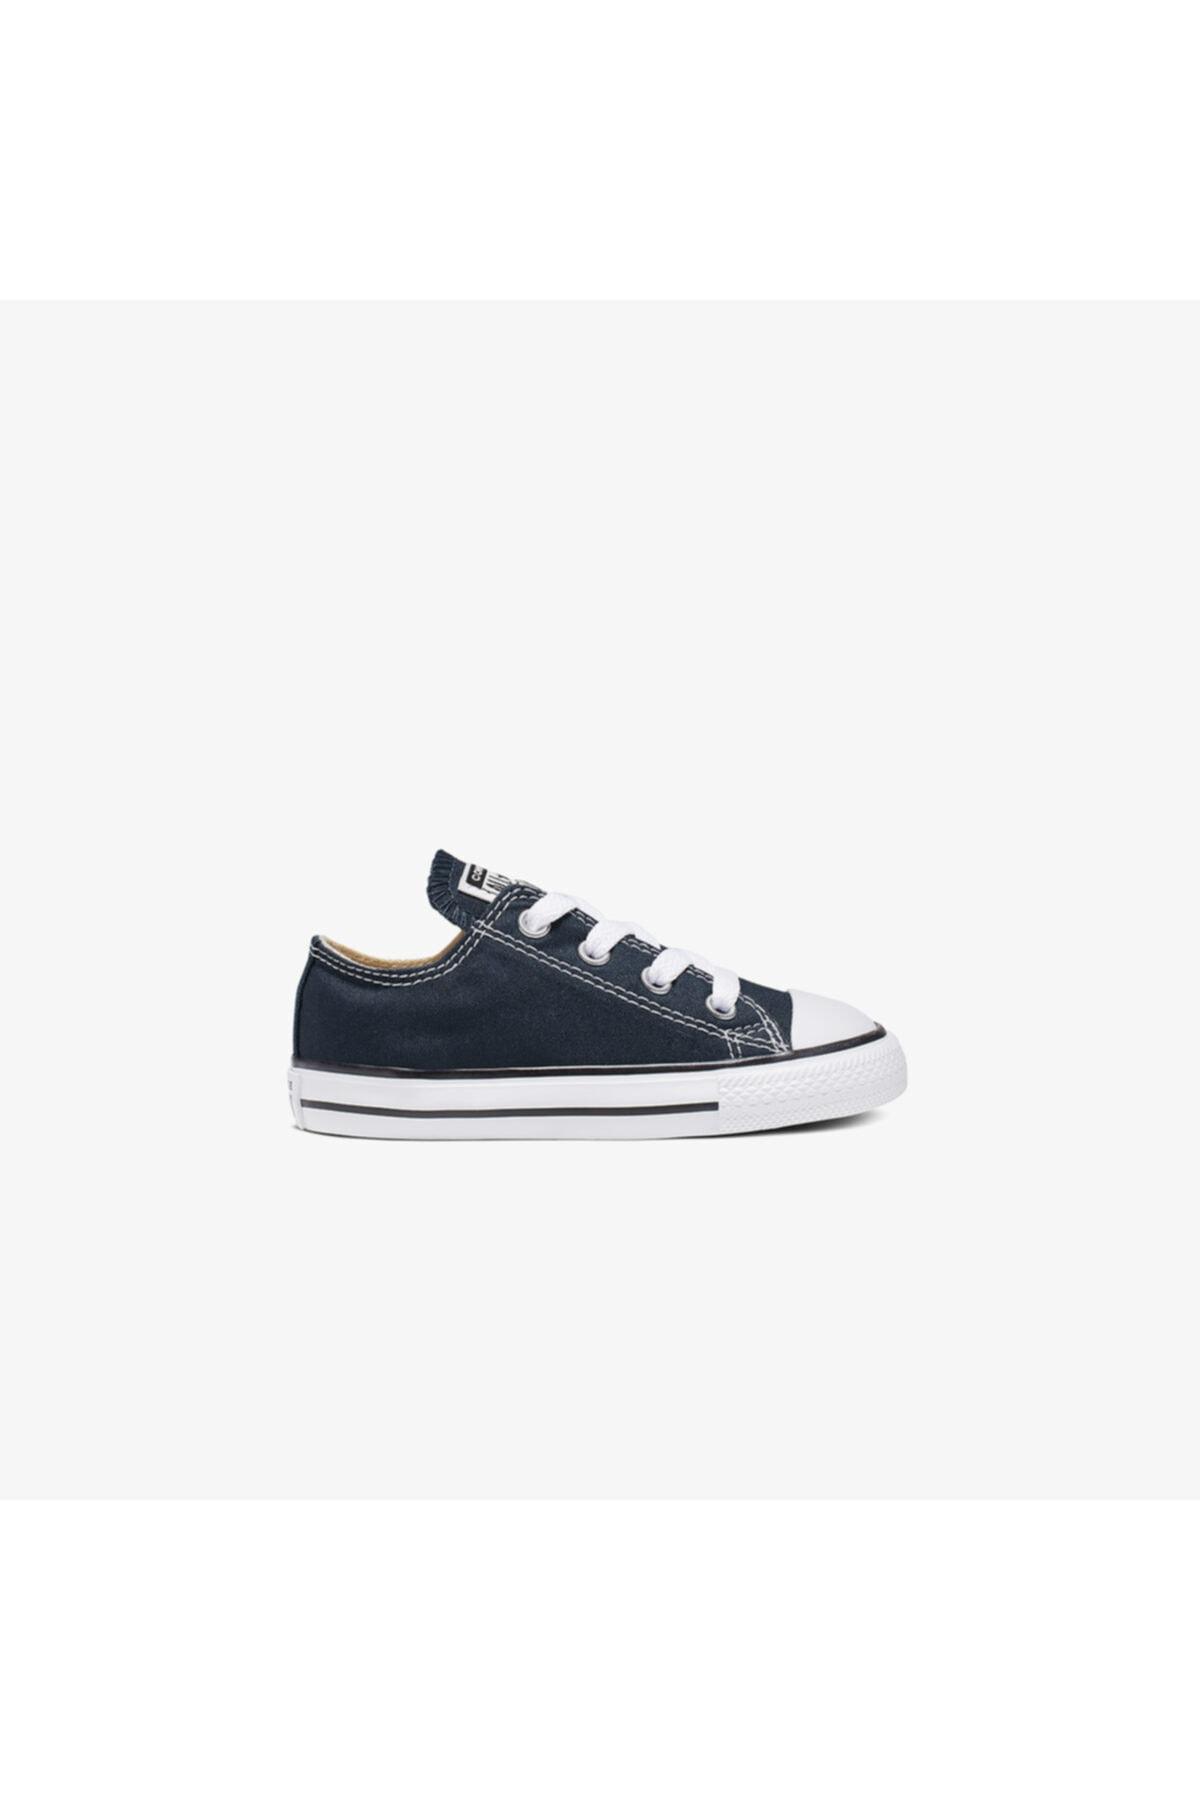 کفش اسپرت بچه گانه پسرانه برند converse رنگ لاجوردی کد ty3878387